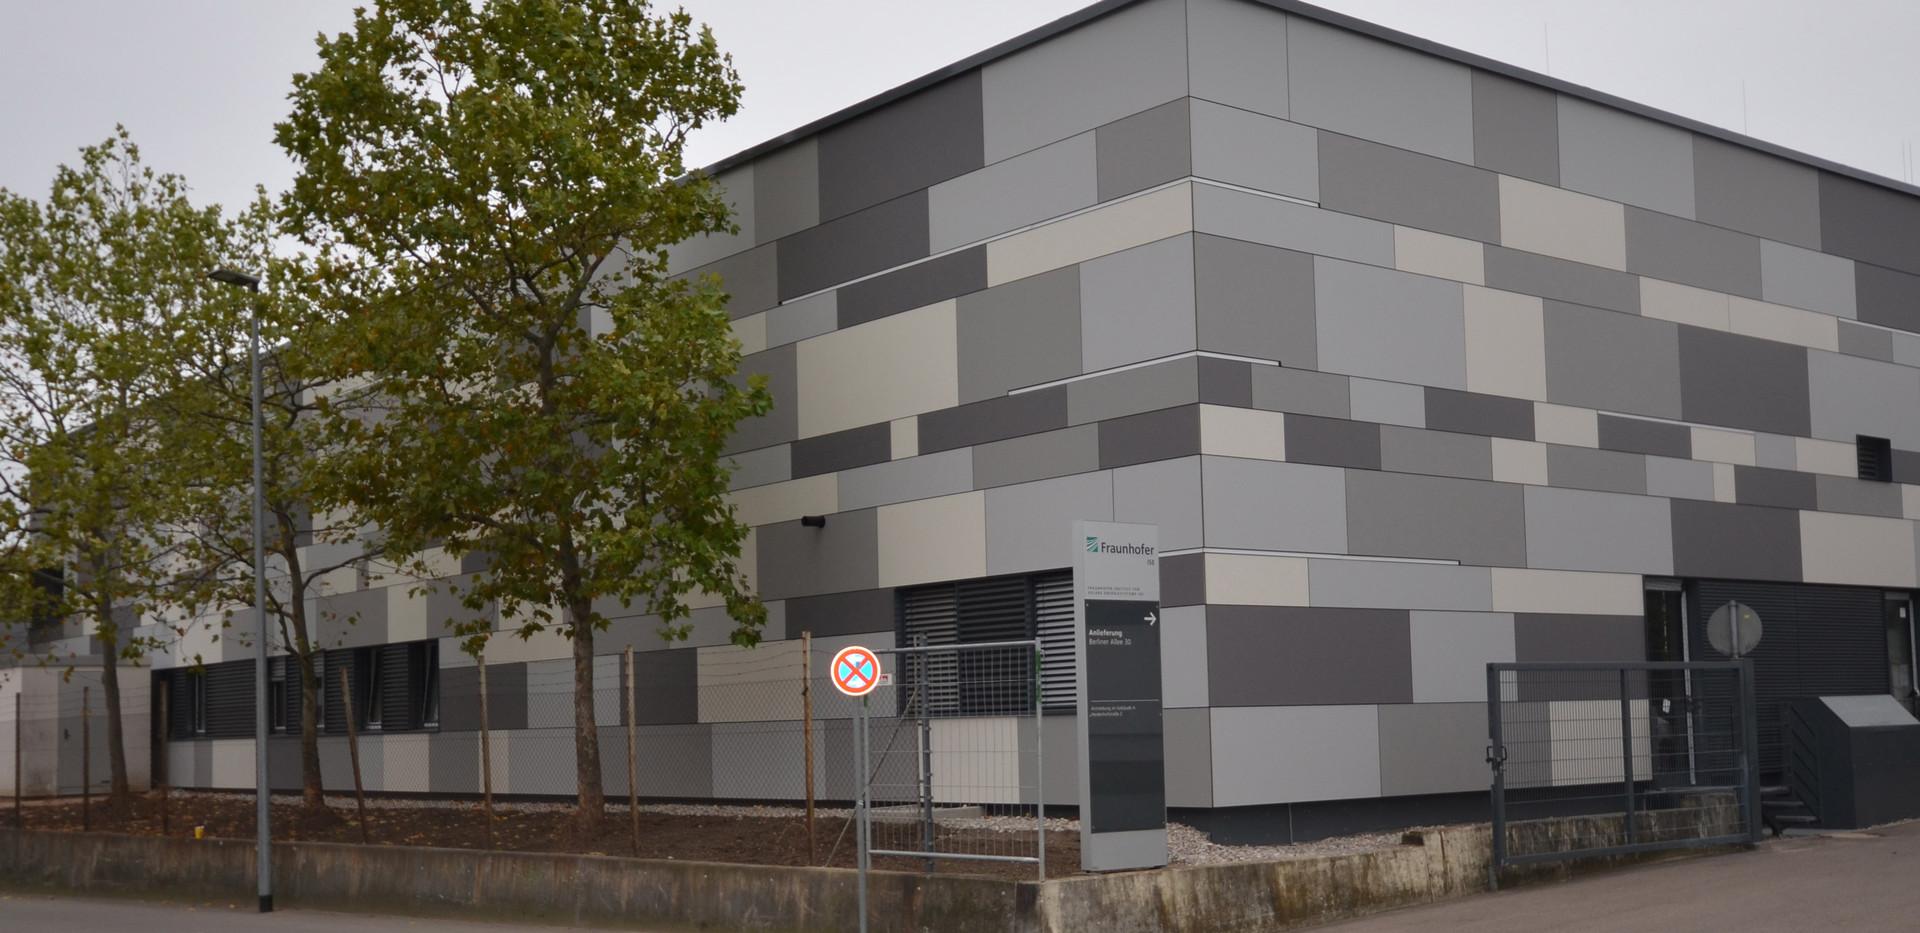 Eternit Equitone Pictura Fassade